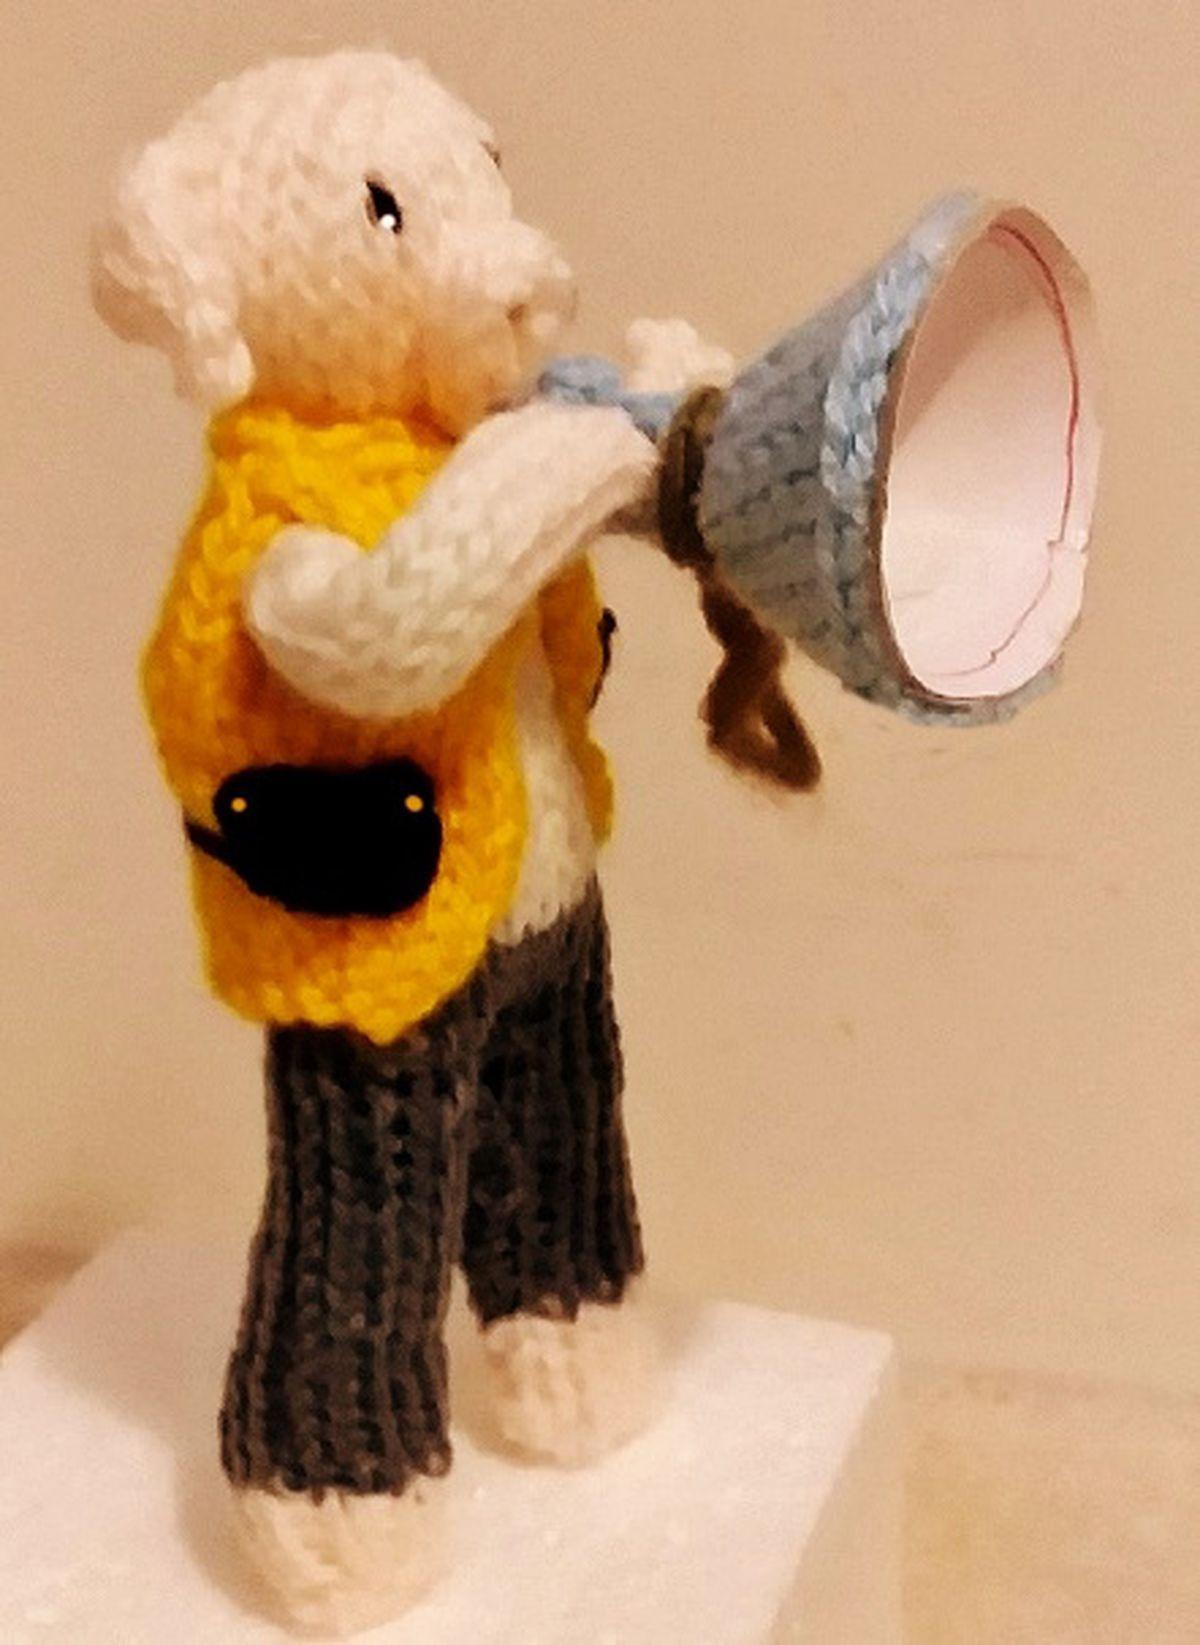 'Hamplify' – one of Rita's knitted woollen pigs